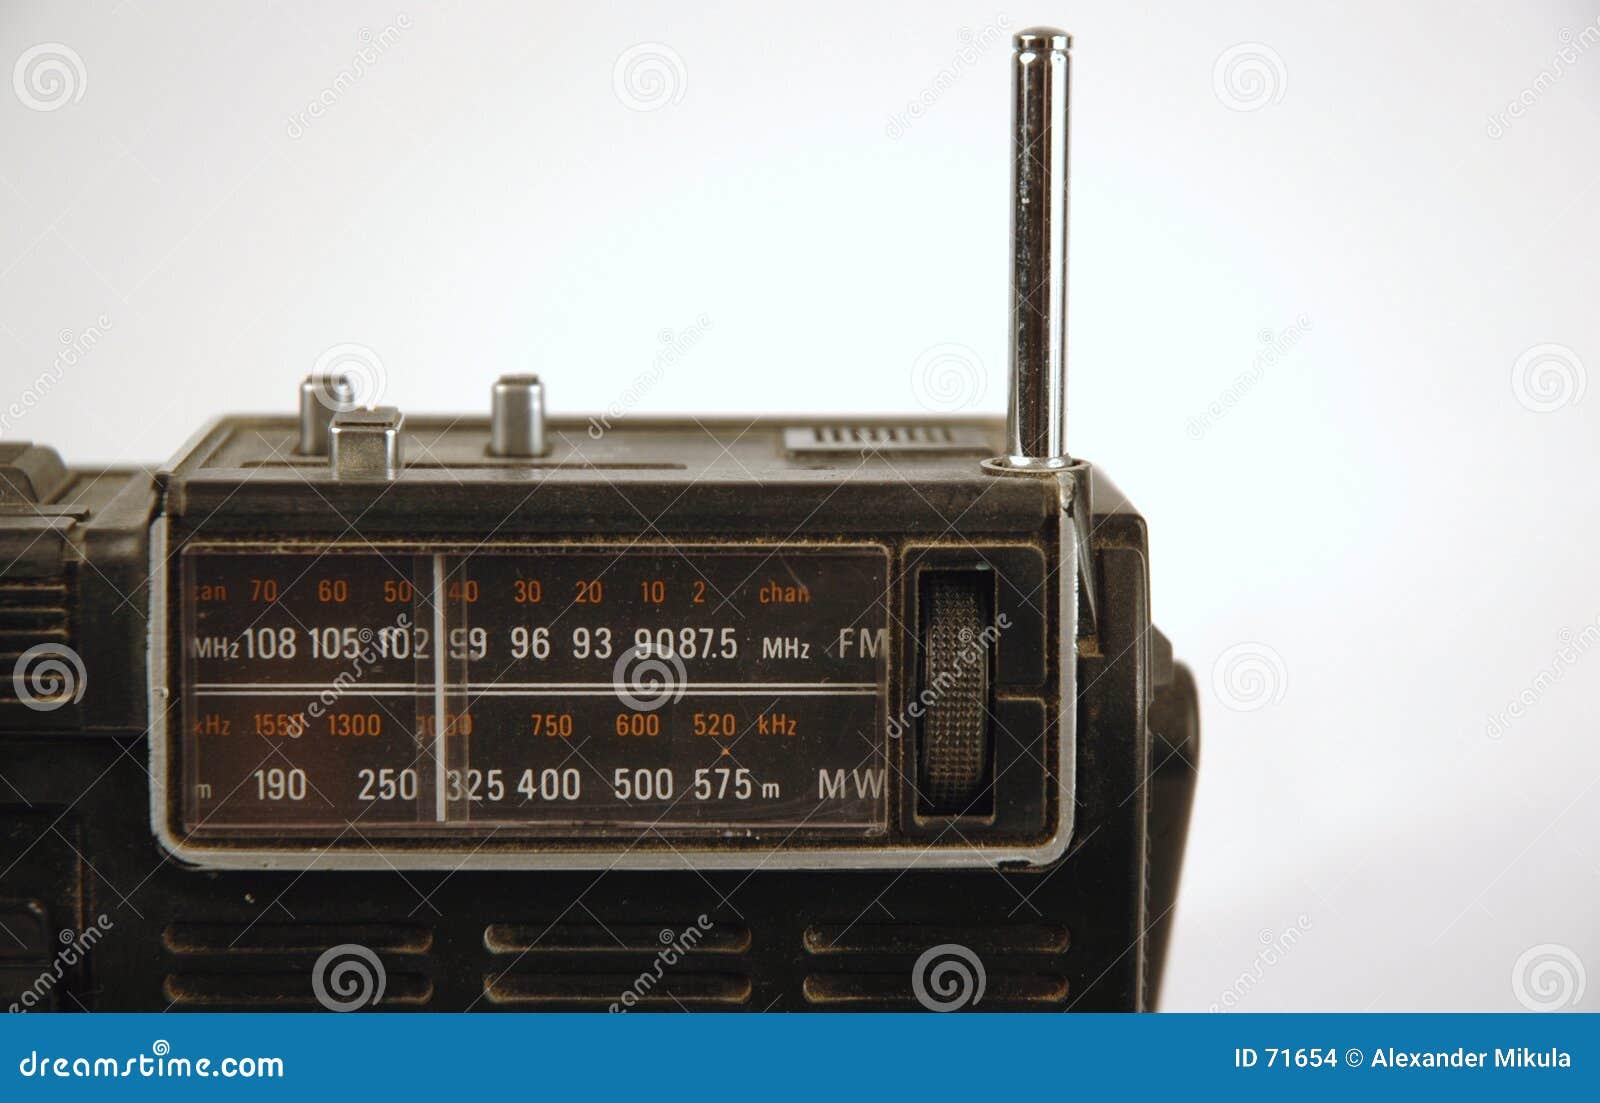 Jag radio